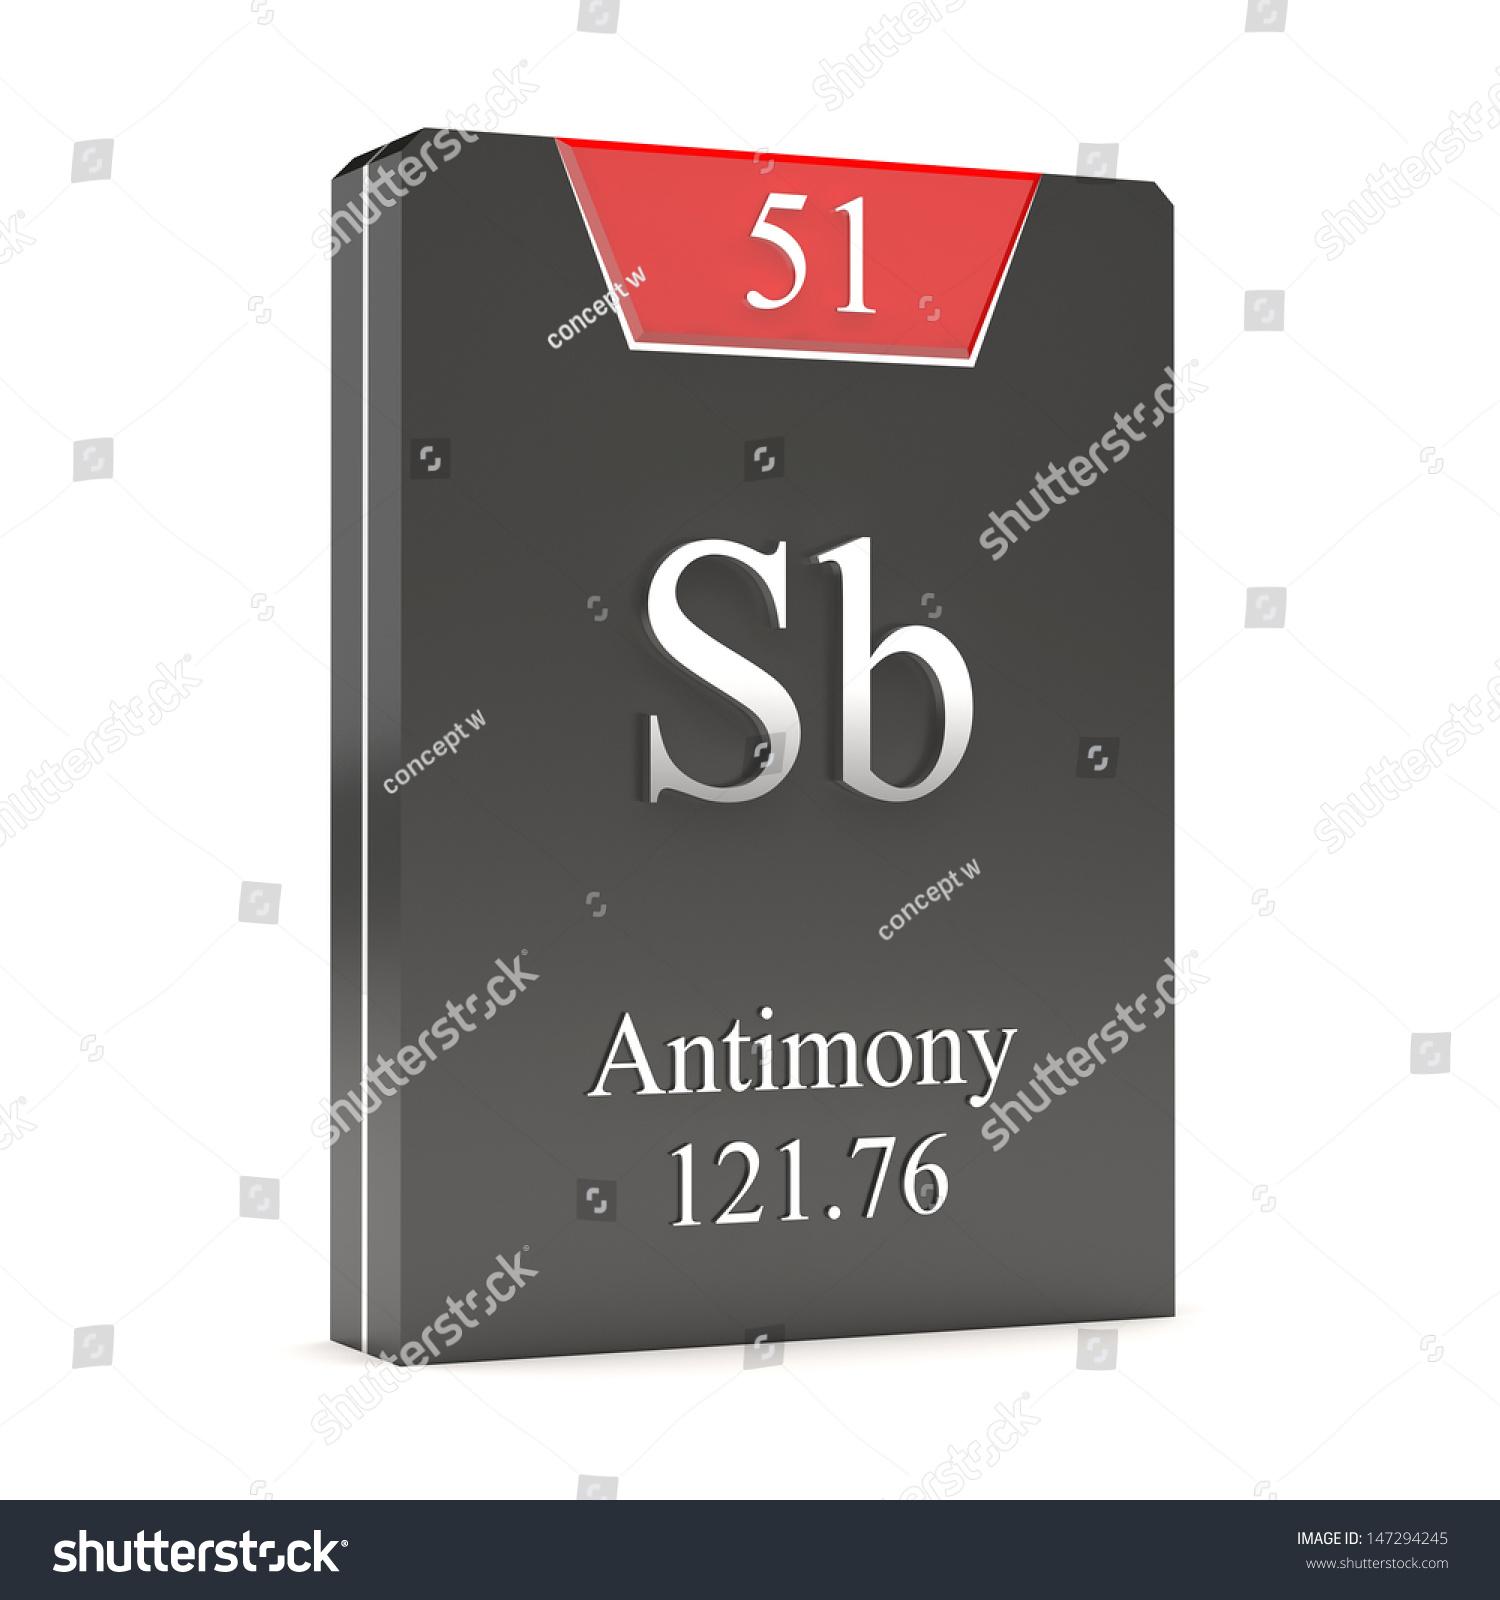 Antimony sb 51 periodic table stock illustration 147294245 antimony sb 51 from periodic table gamestrikefo Choice Image